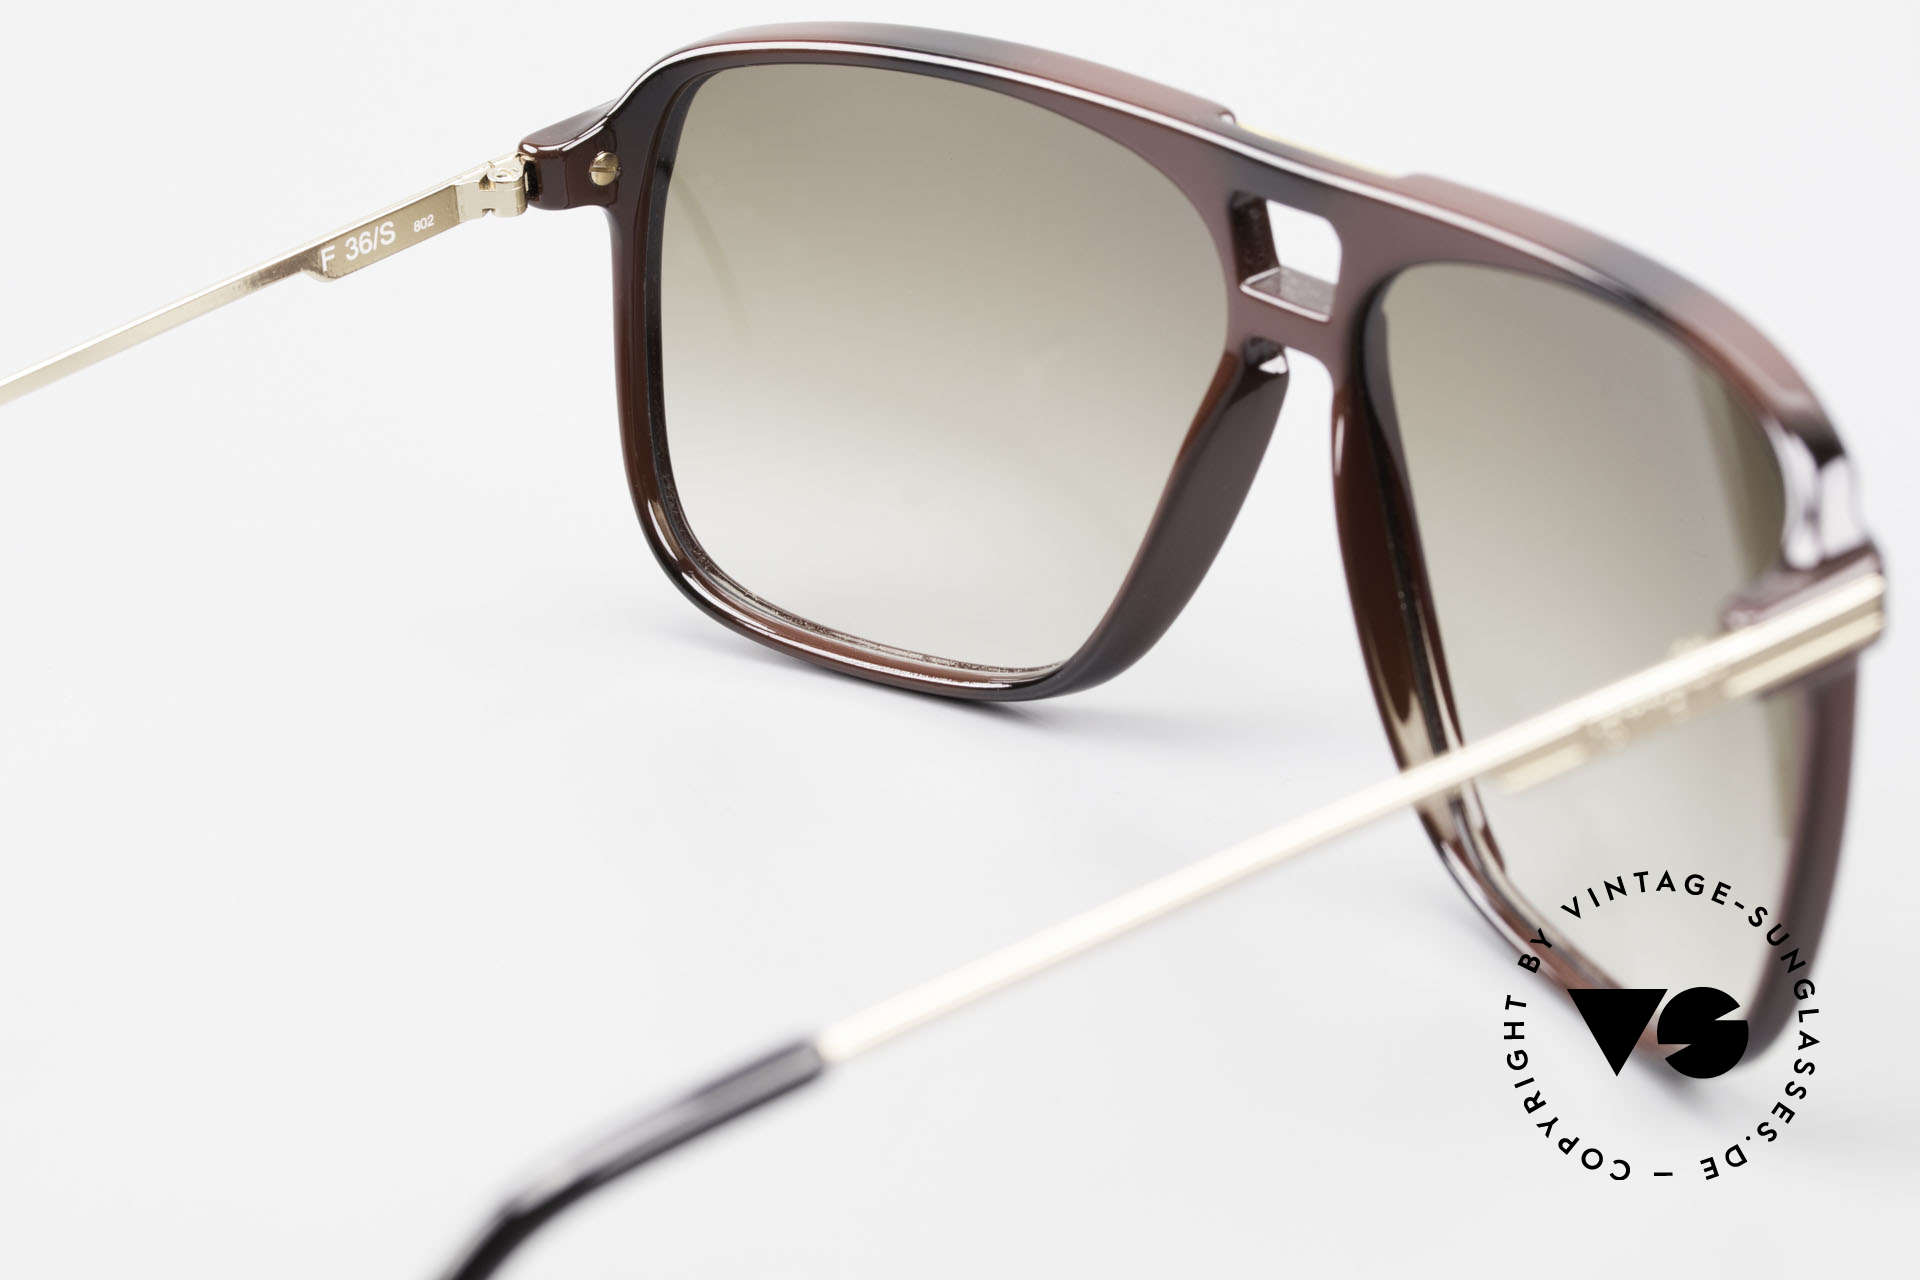 Ferrari F36/S 90's Men's Carbon Sunglasses, Size: large, Made for Men